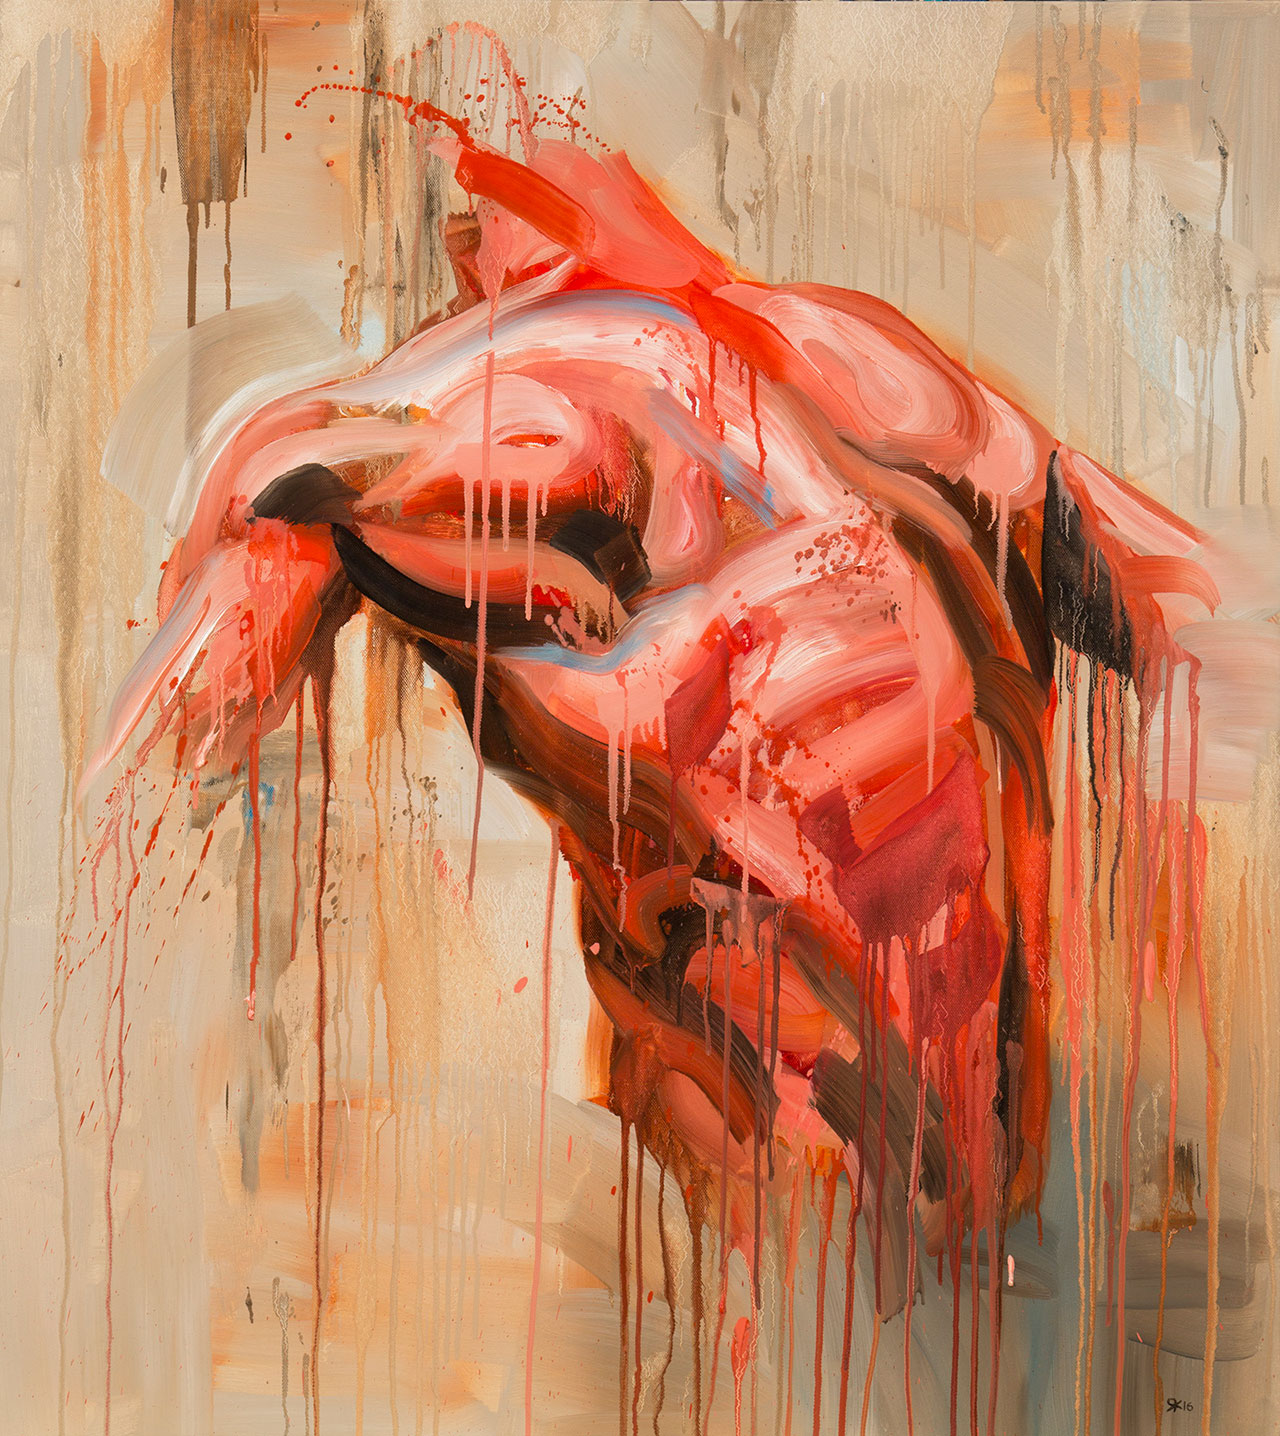 Salman Khoshroo,from the Torso series, 85x95cm, oil on canvas.